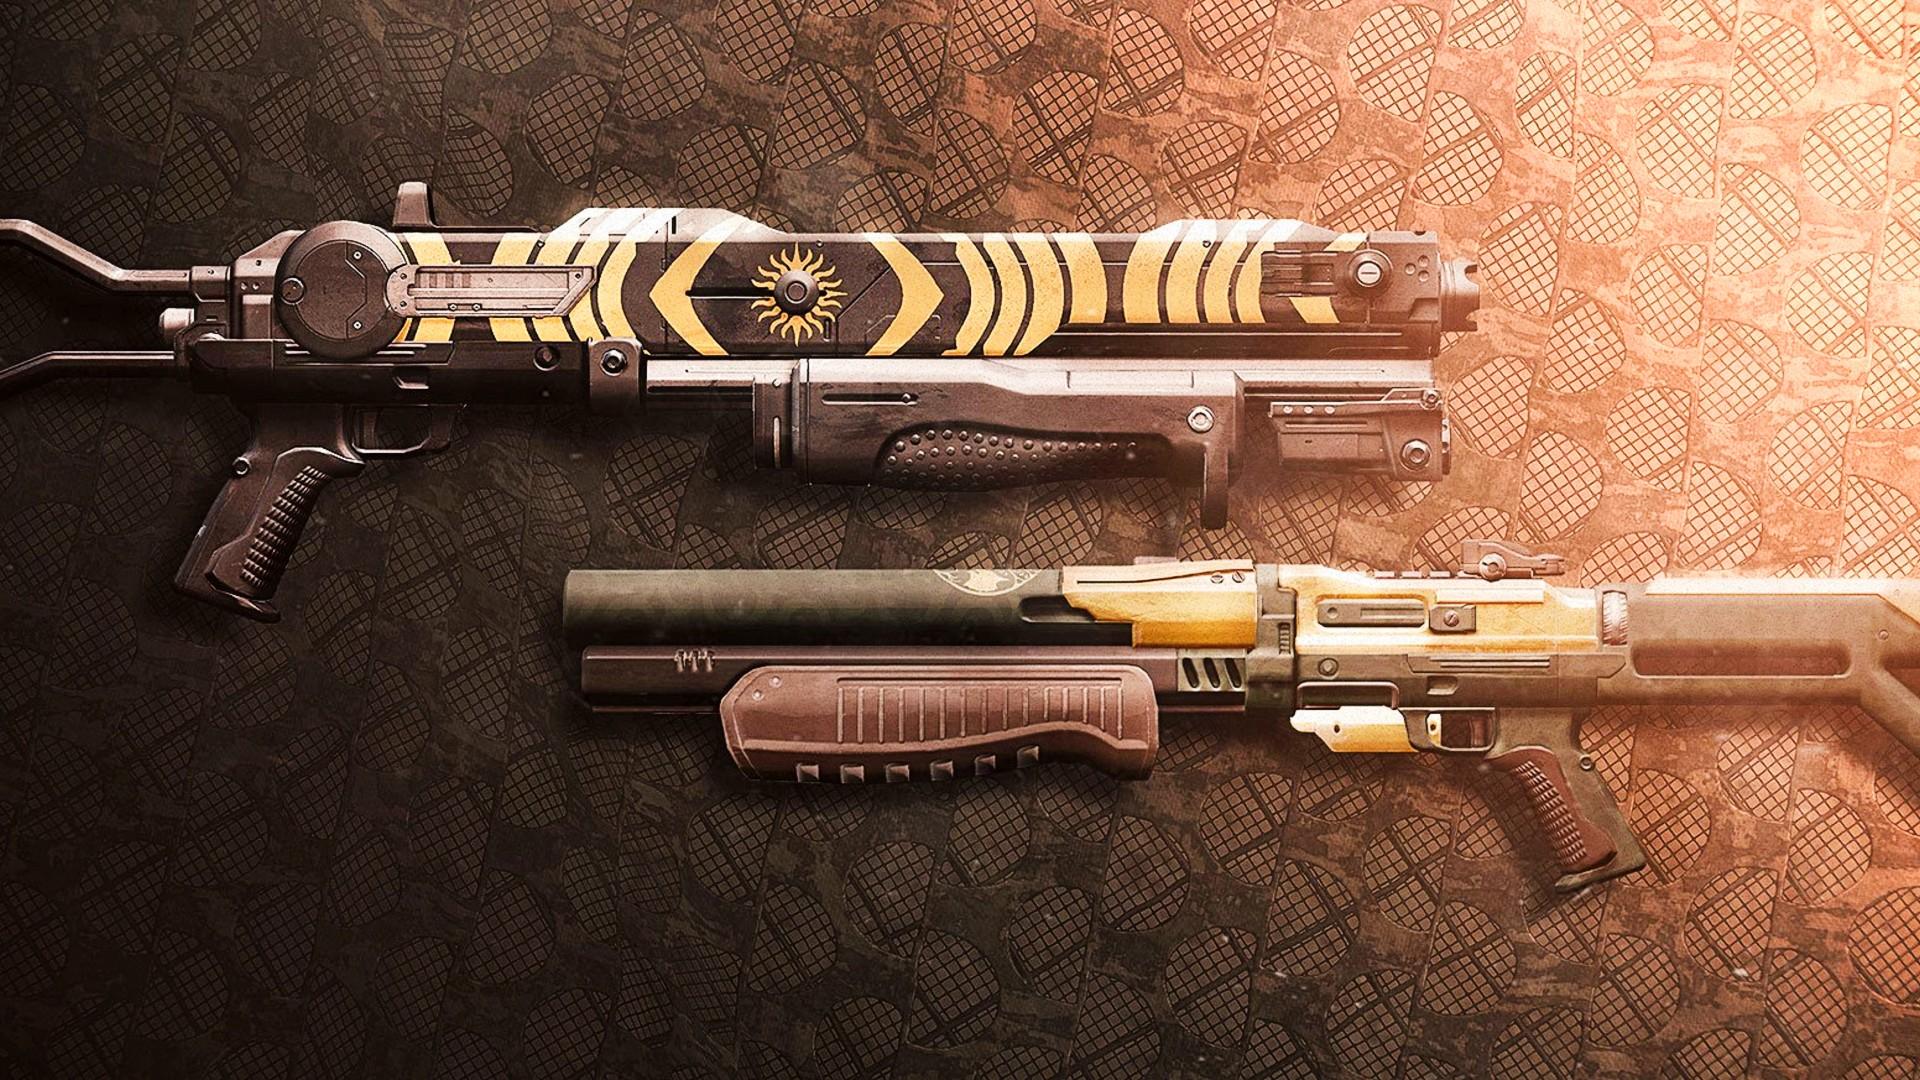 Destiny 2's best shotguns are getting nerfed